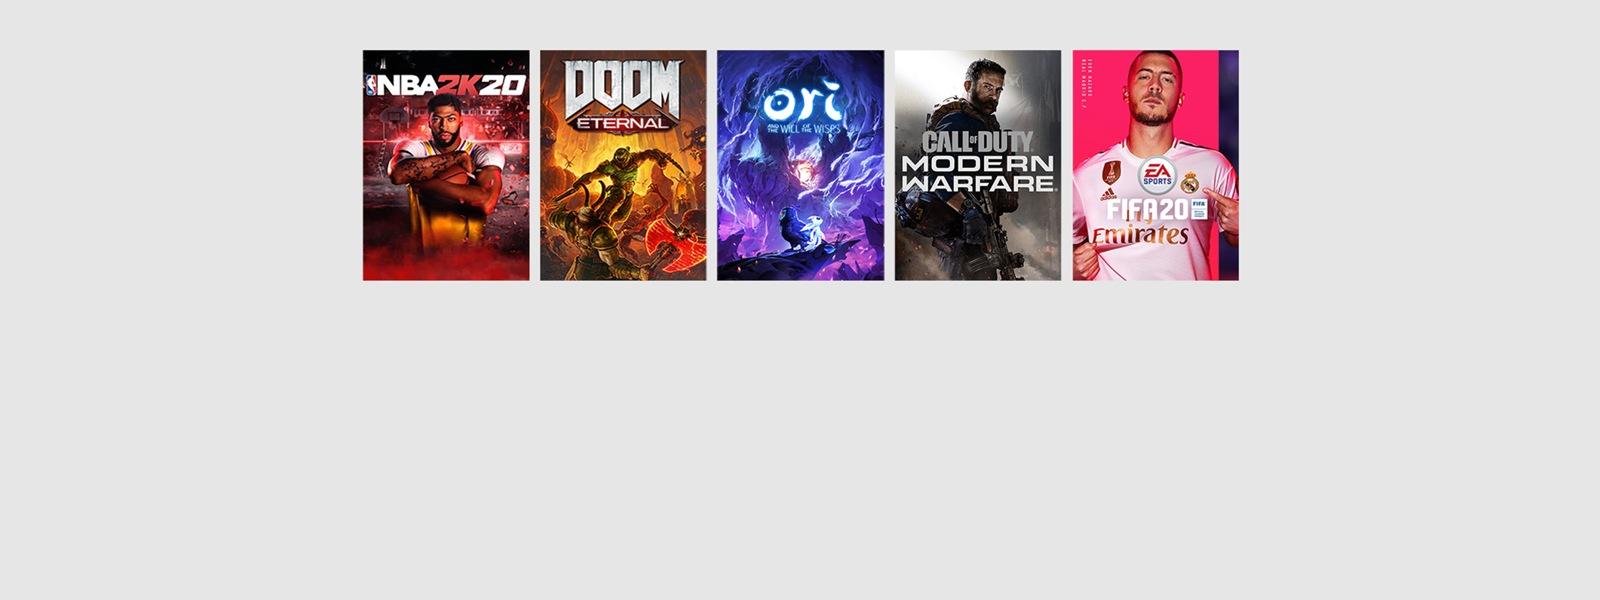 NBA2K20, Doom Eternal, Ori, Call of Duty, FIFA20